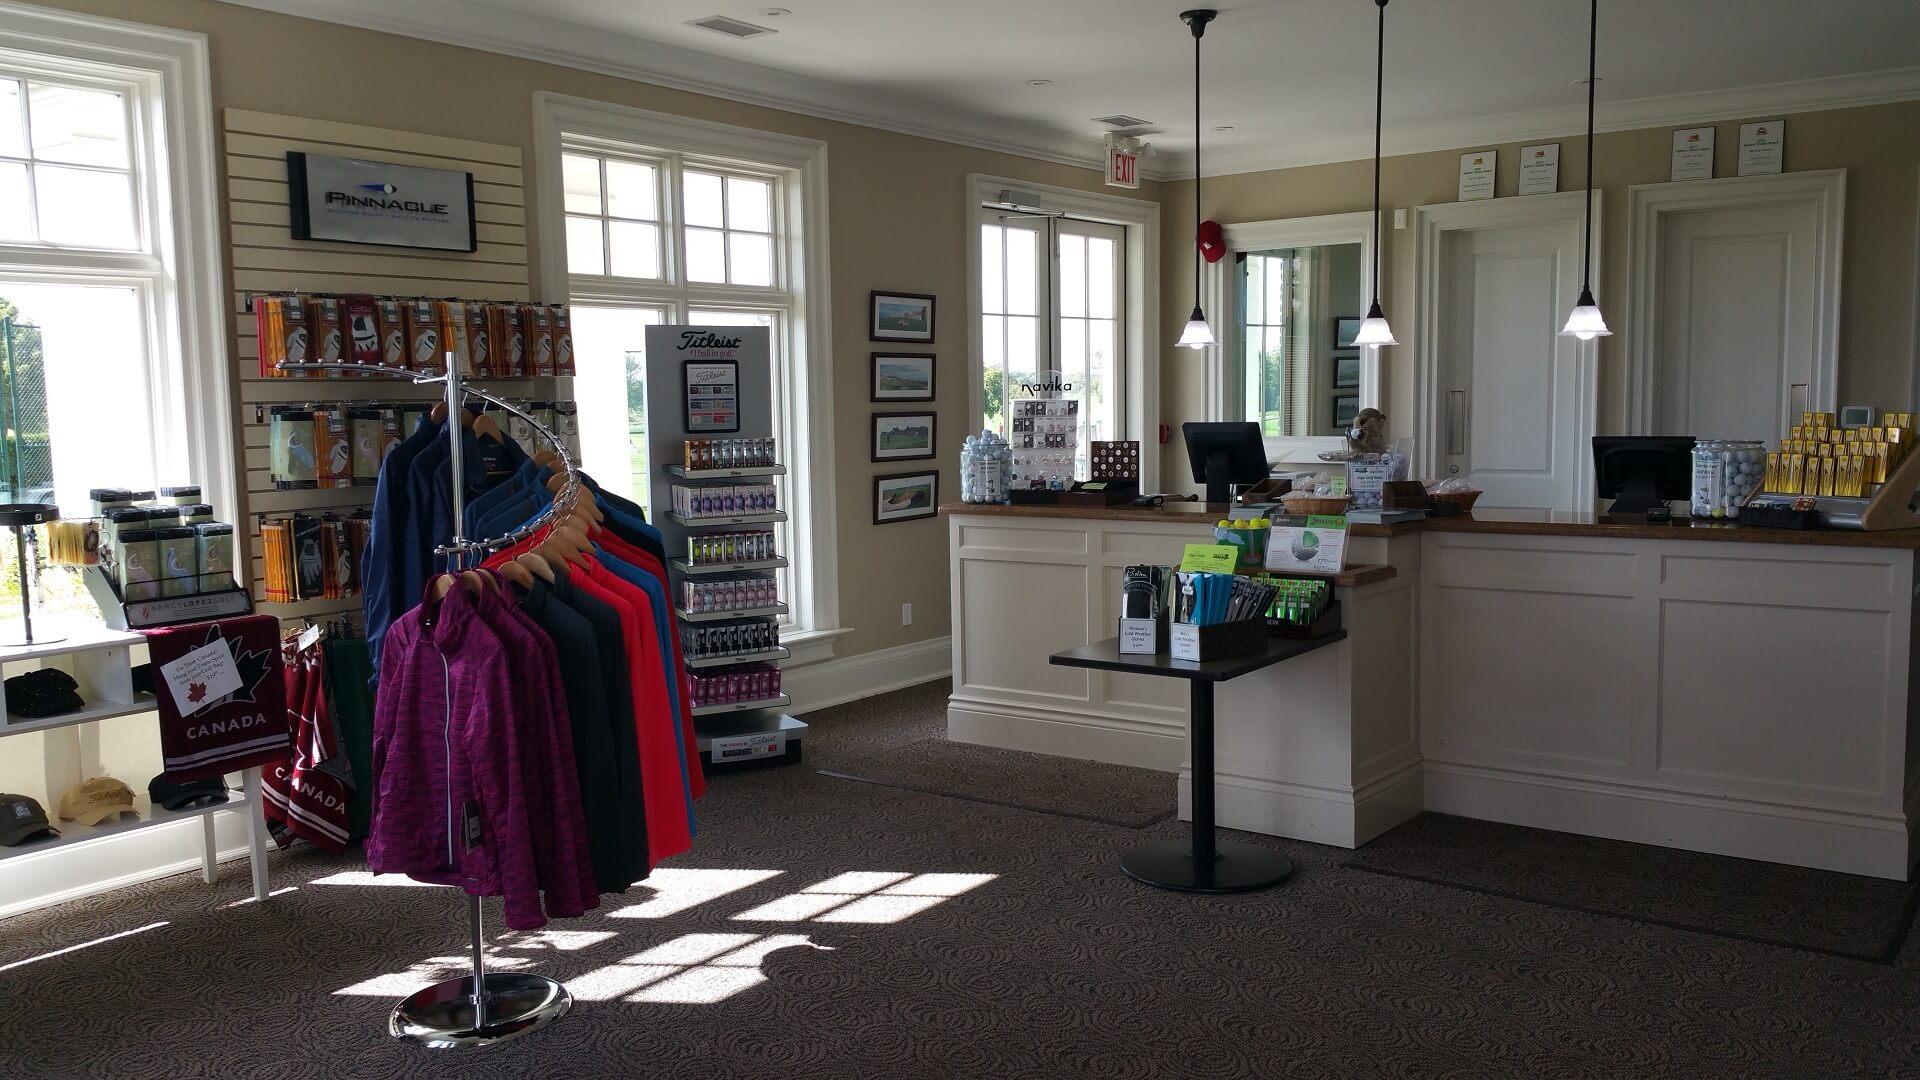 oakville executive golf shop